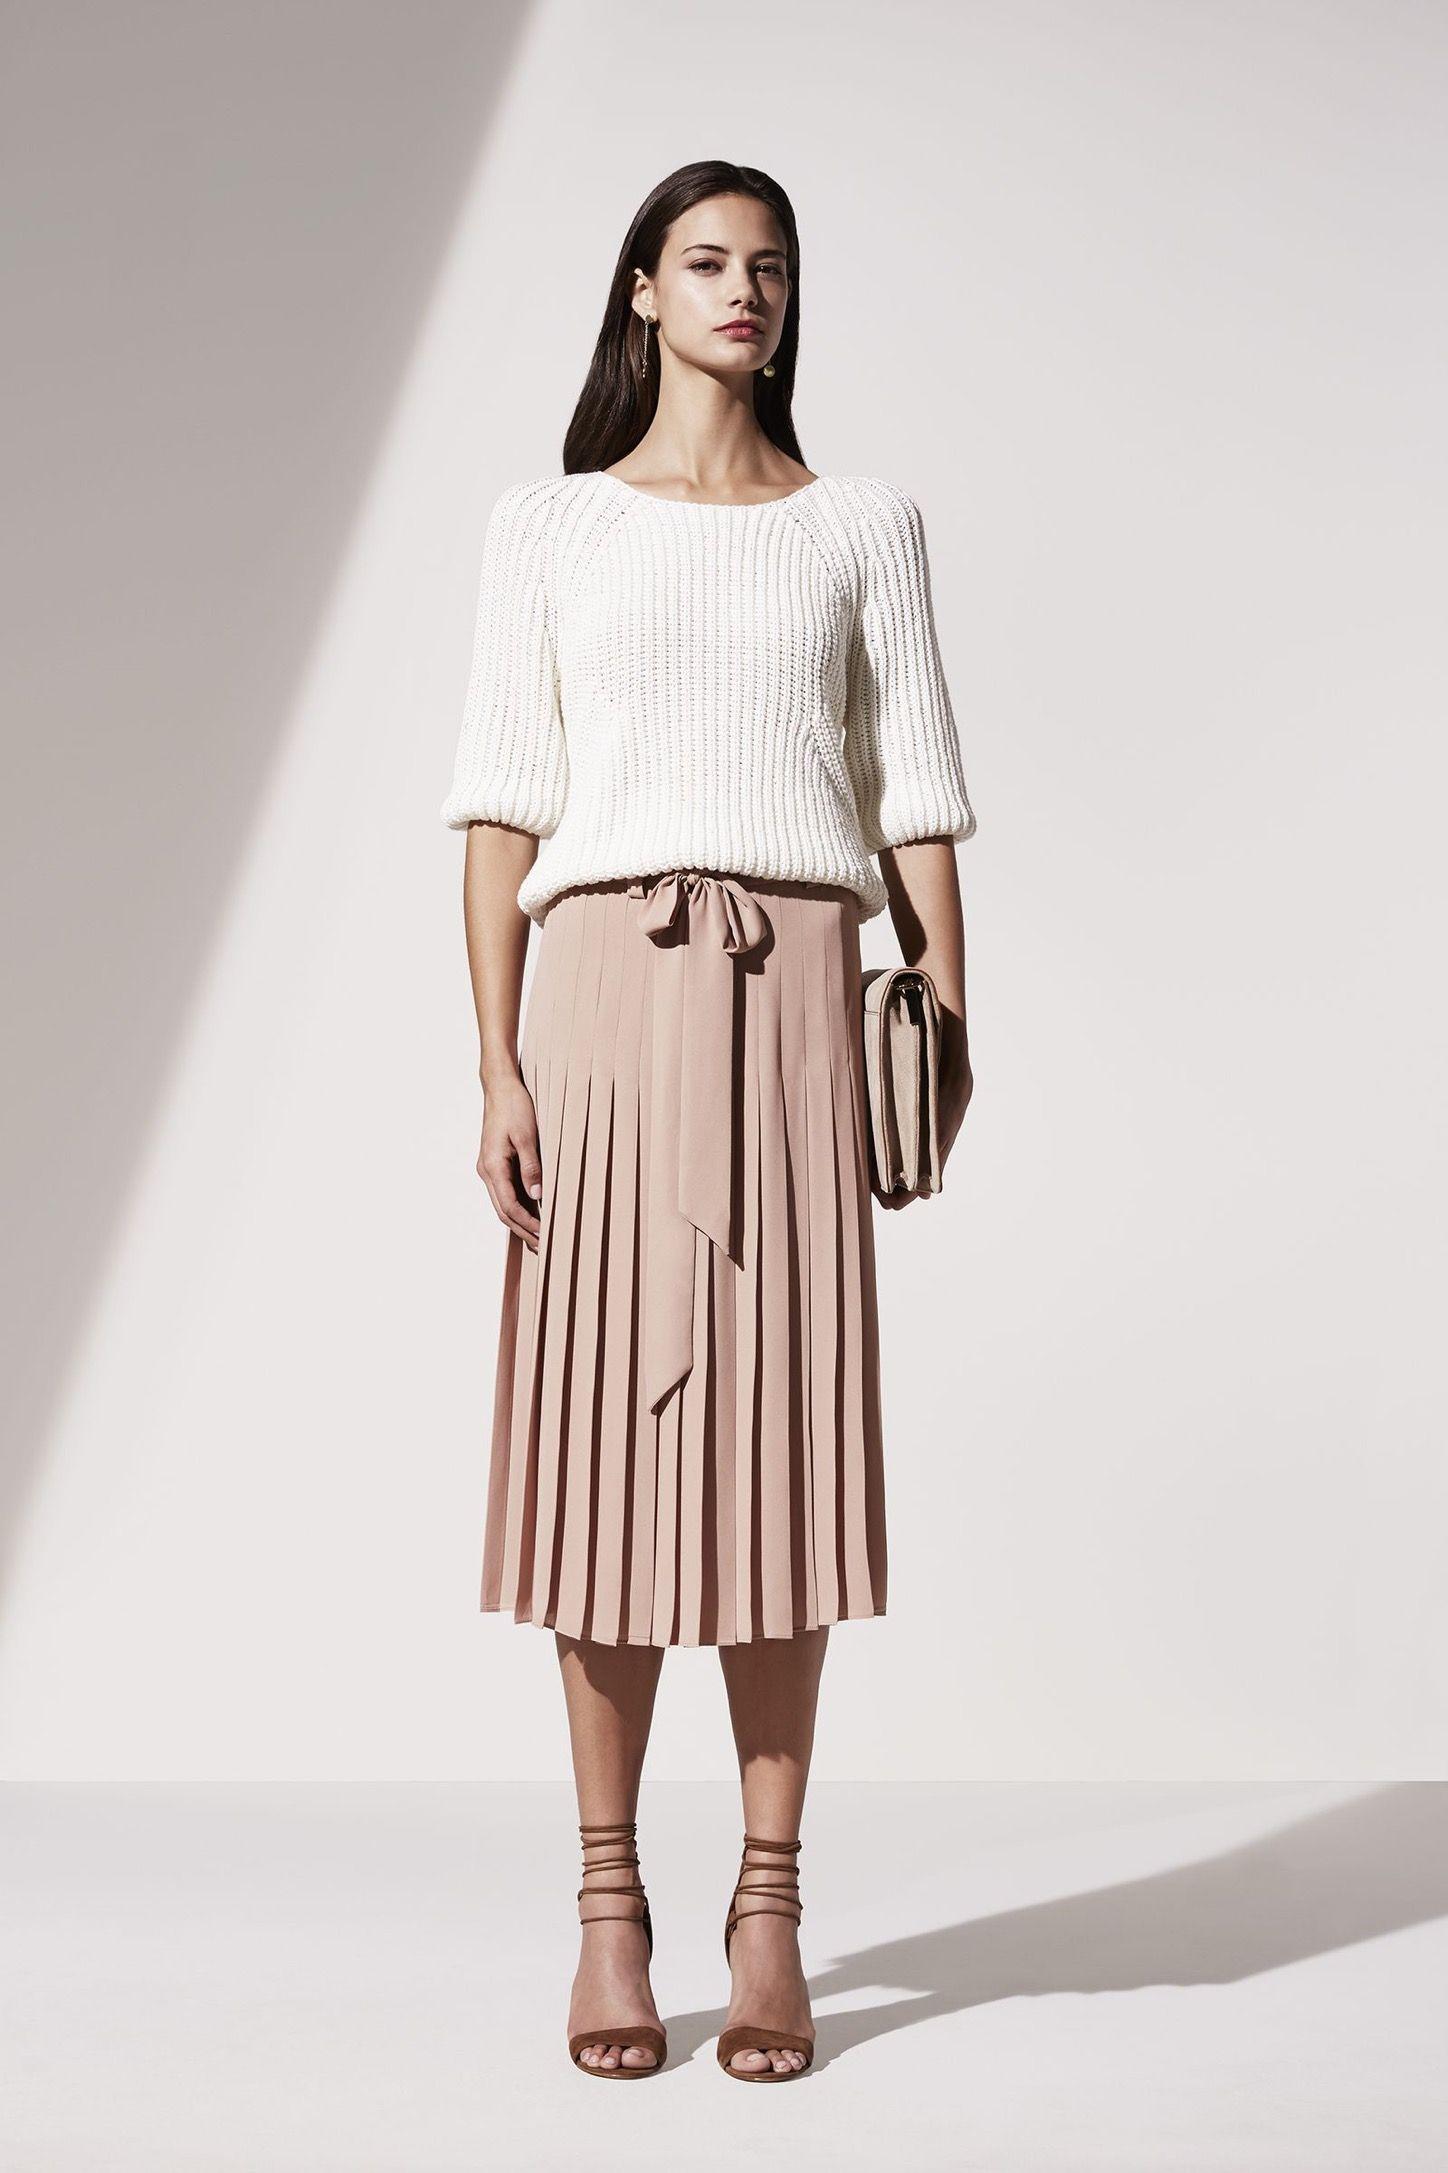 Pin by mary pat nanney on springsummer fashion inspiration pinterest